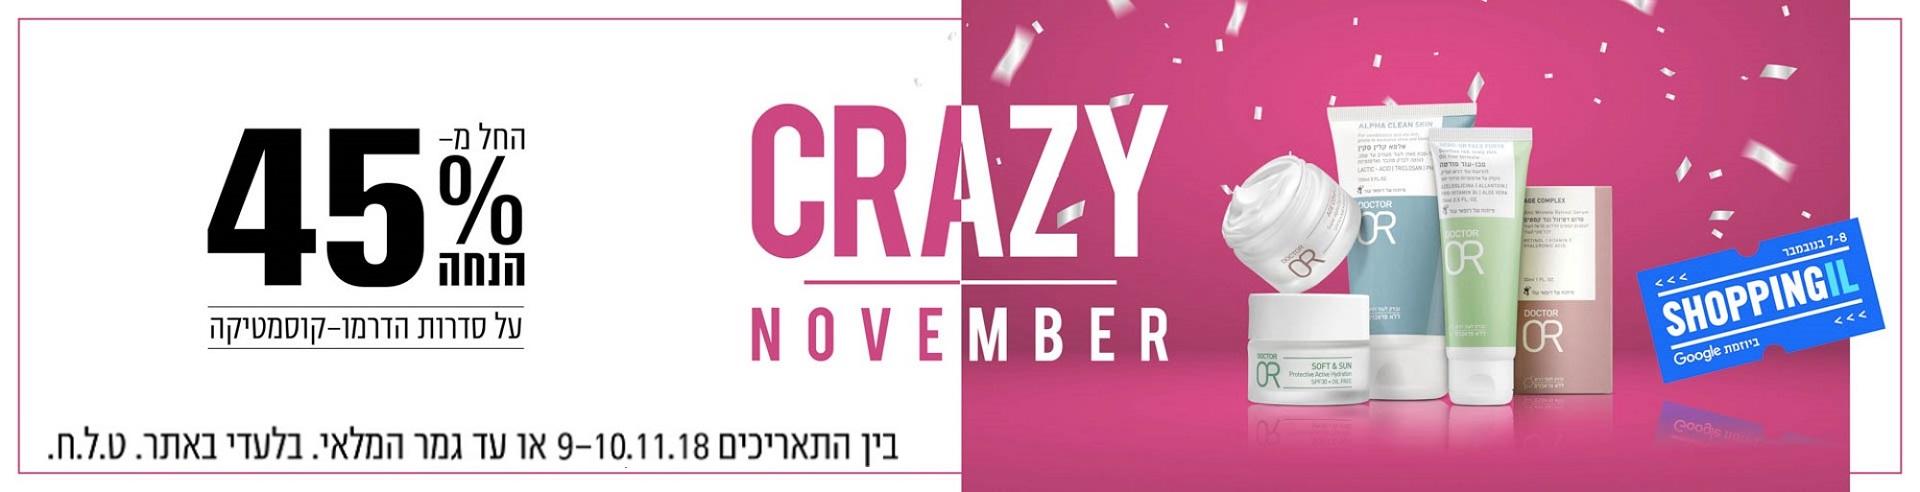 Crazy November.החל מ-45% הנחה. בין התאריכים 9-10.11.19 או עד גמר המלאי. בלעדי באתר.